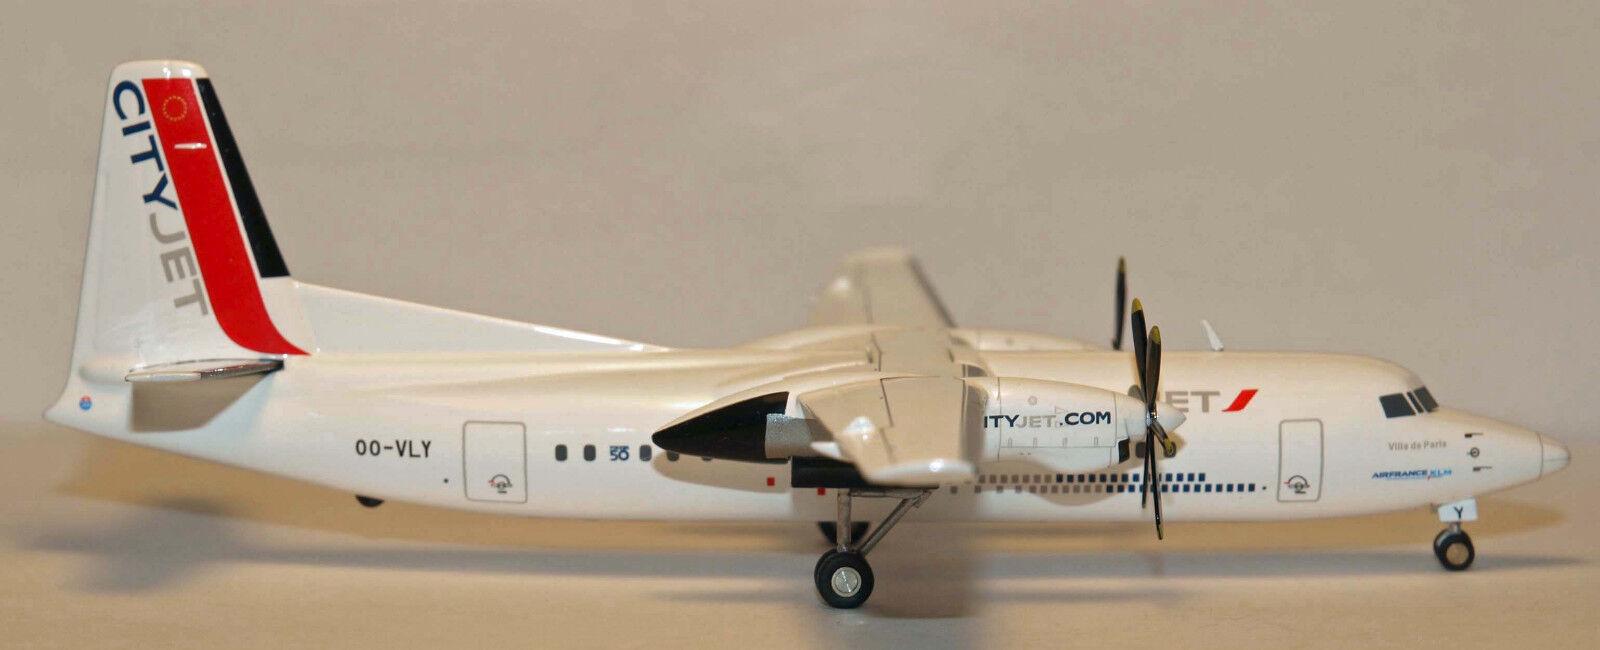 Herpa Wings Wings Wings 1 200 ciudad Jet Air France Fokker 50 F-50 Prod Id 554640 relsd 2012 24b0a0